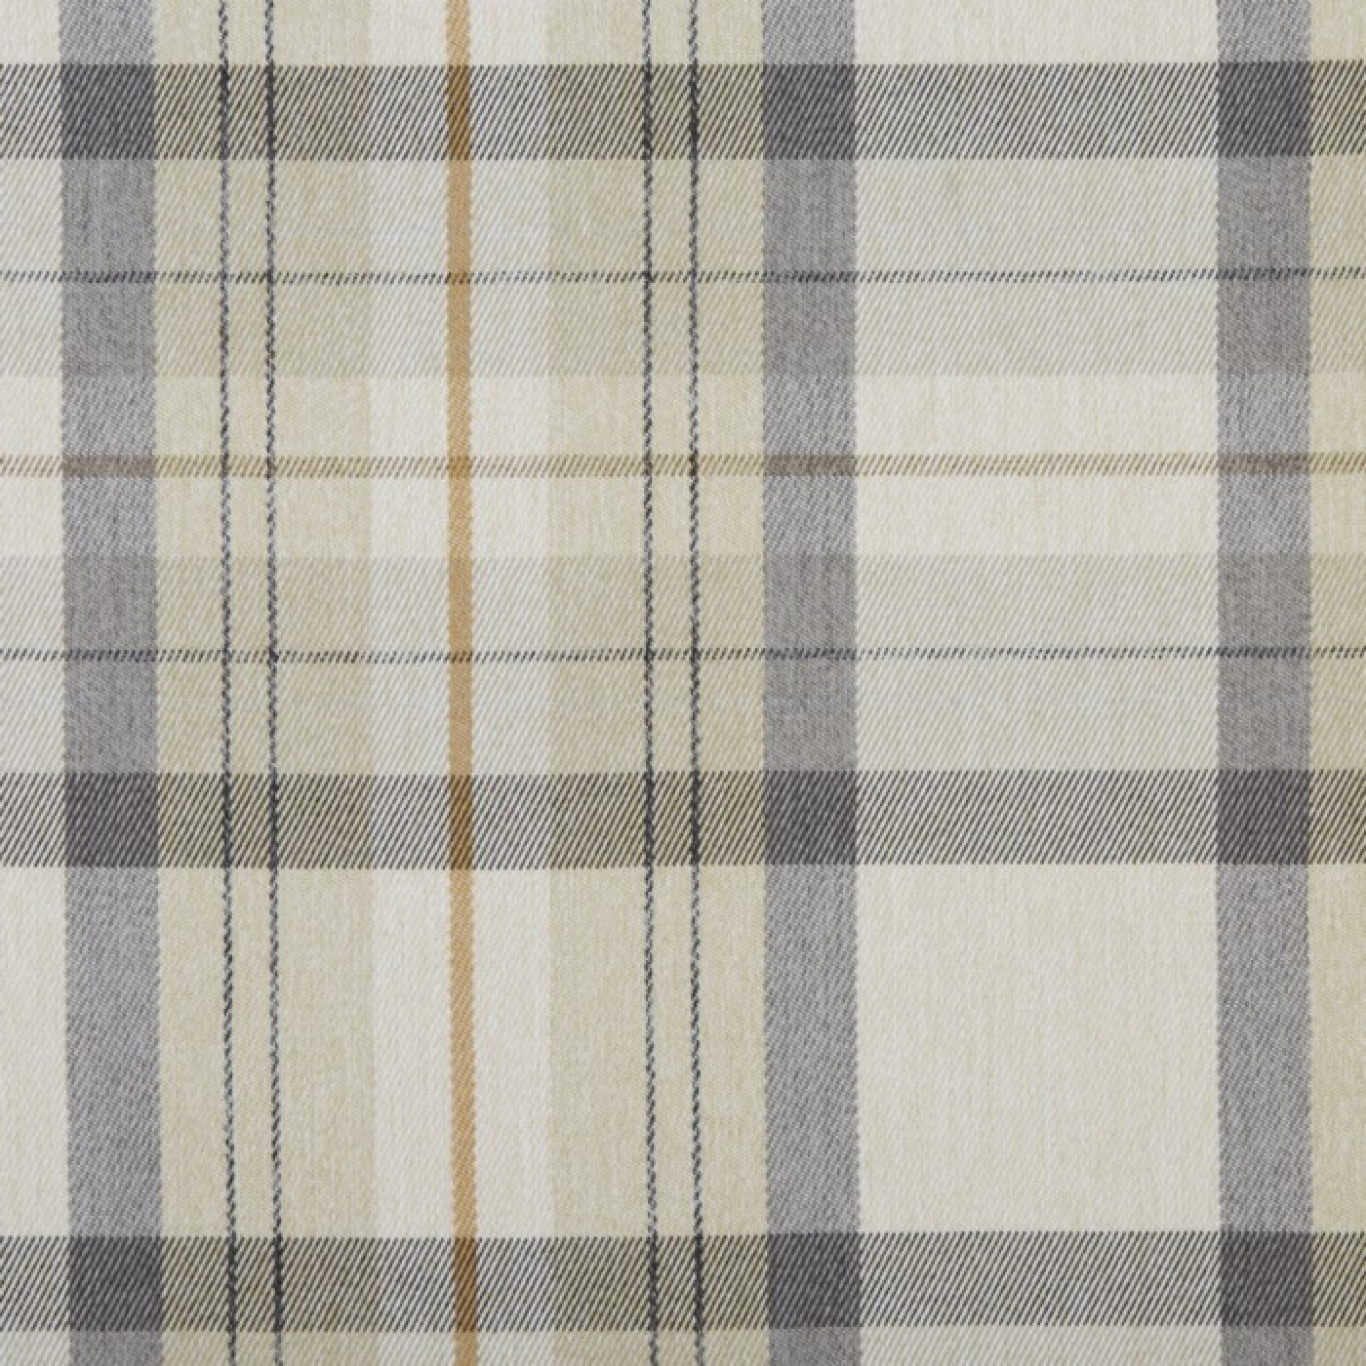 Image of Prestigious Cairngorm Oatmeal Fabric